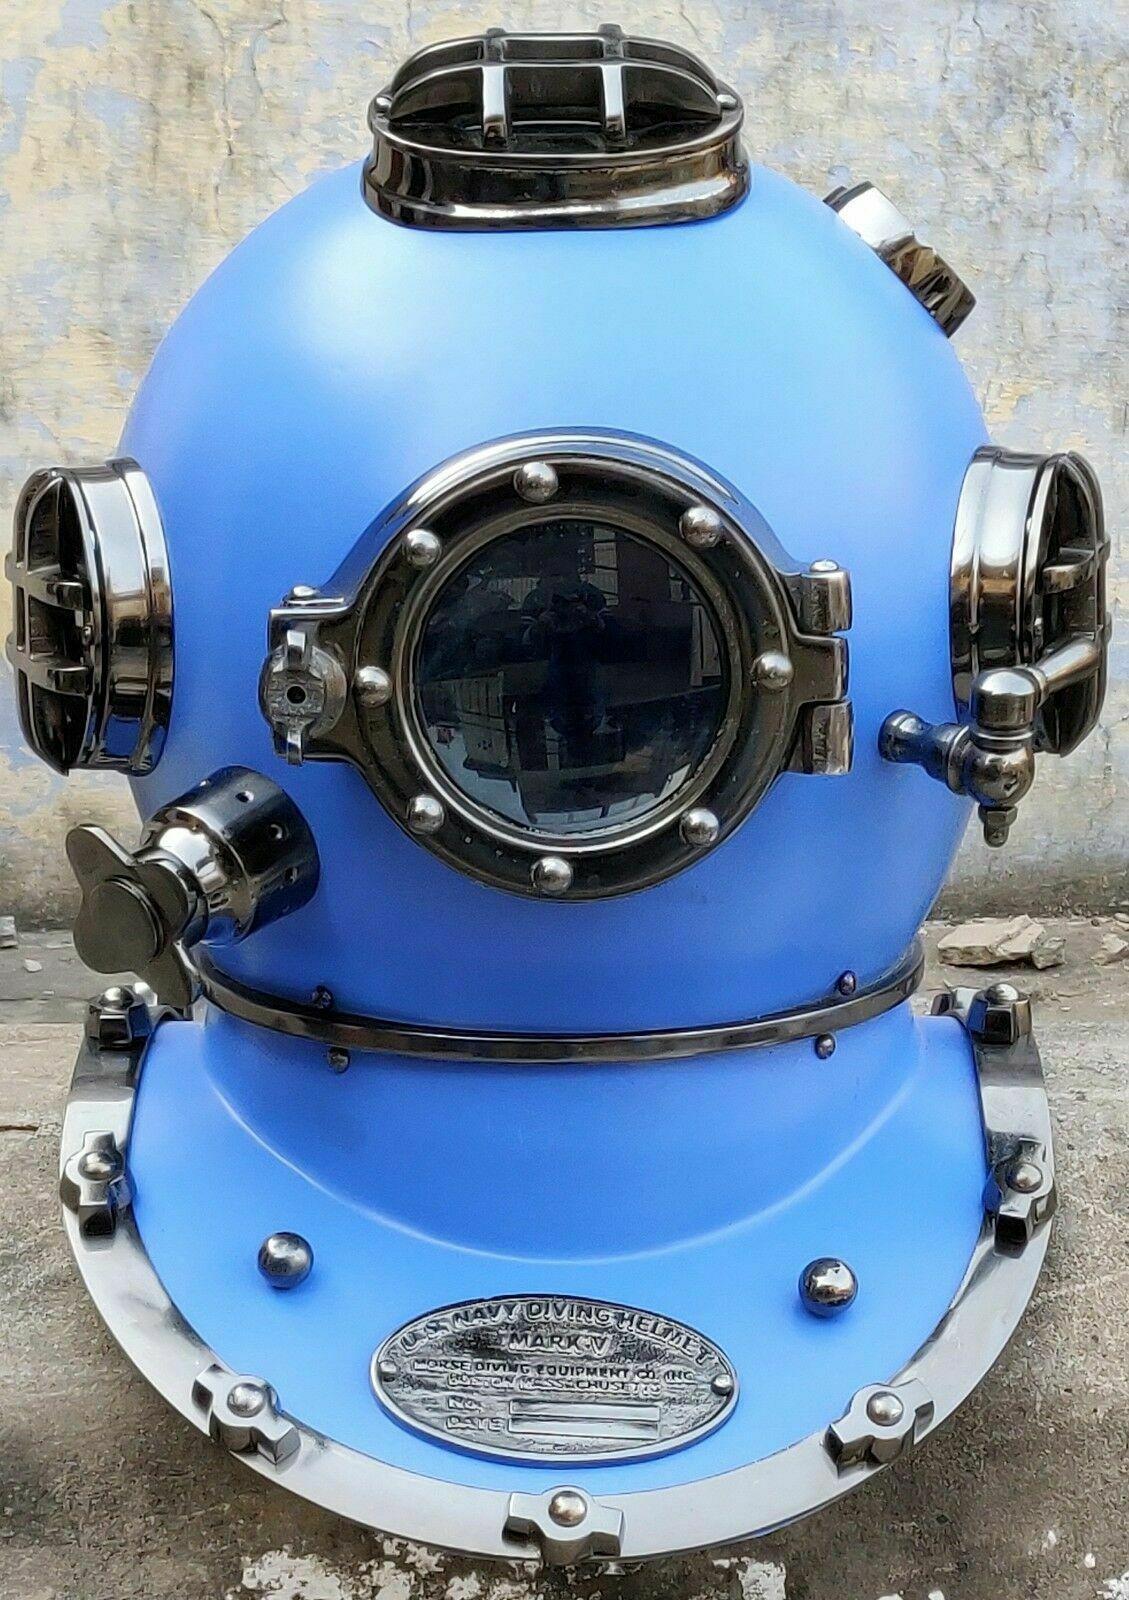 Brass Divers Helmet Maritime Diving Mark V Decorative